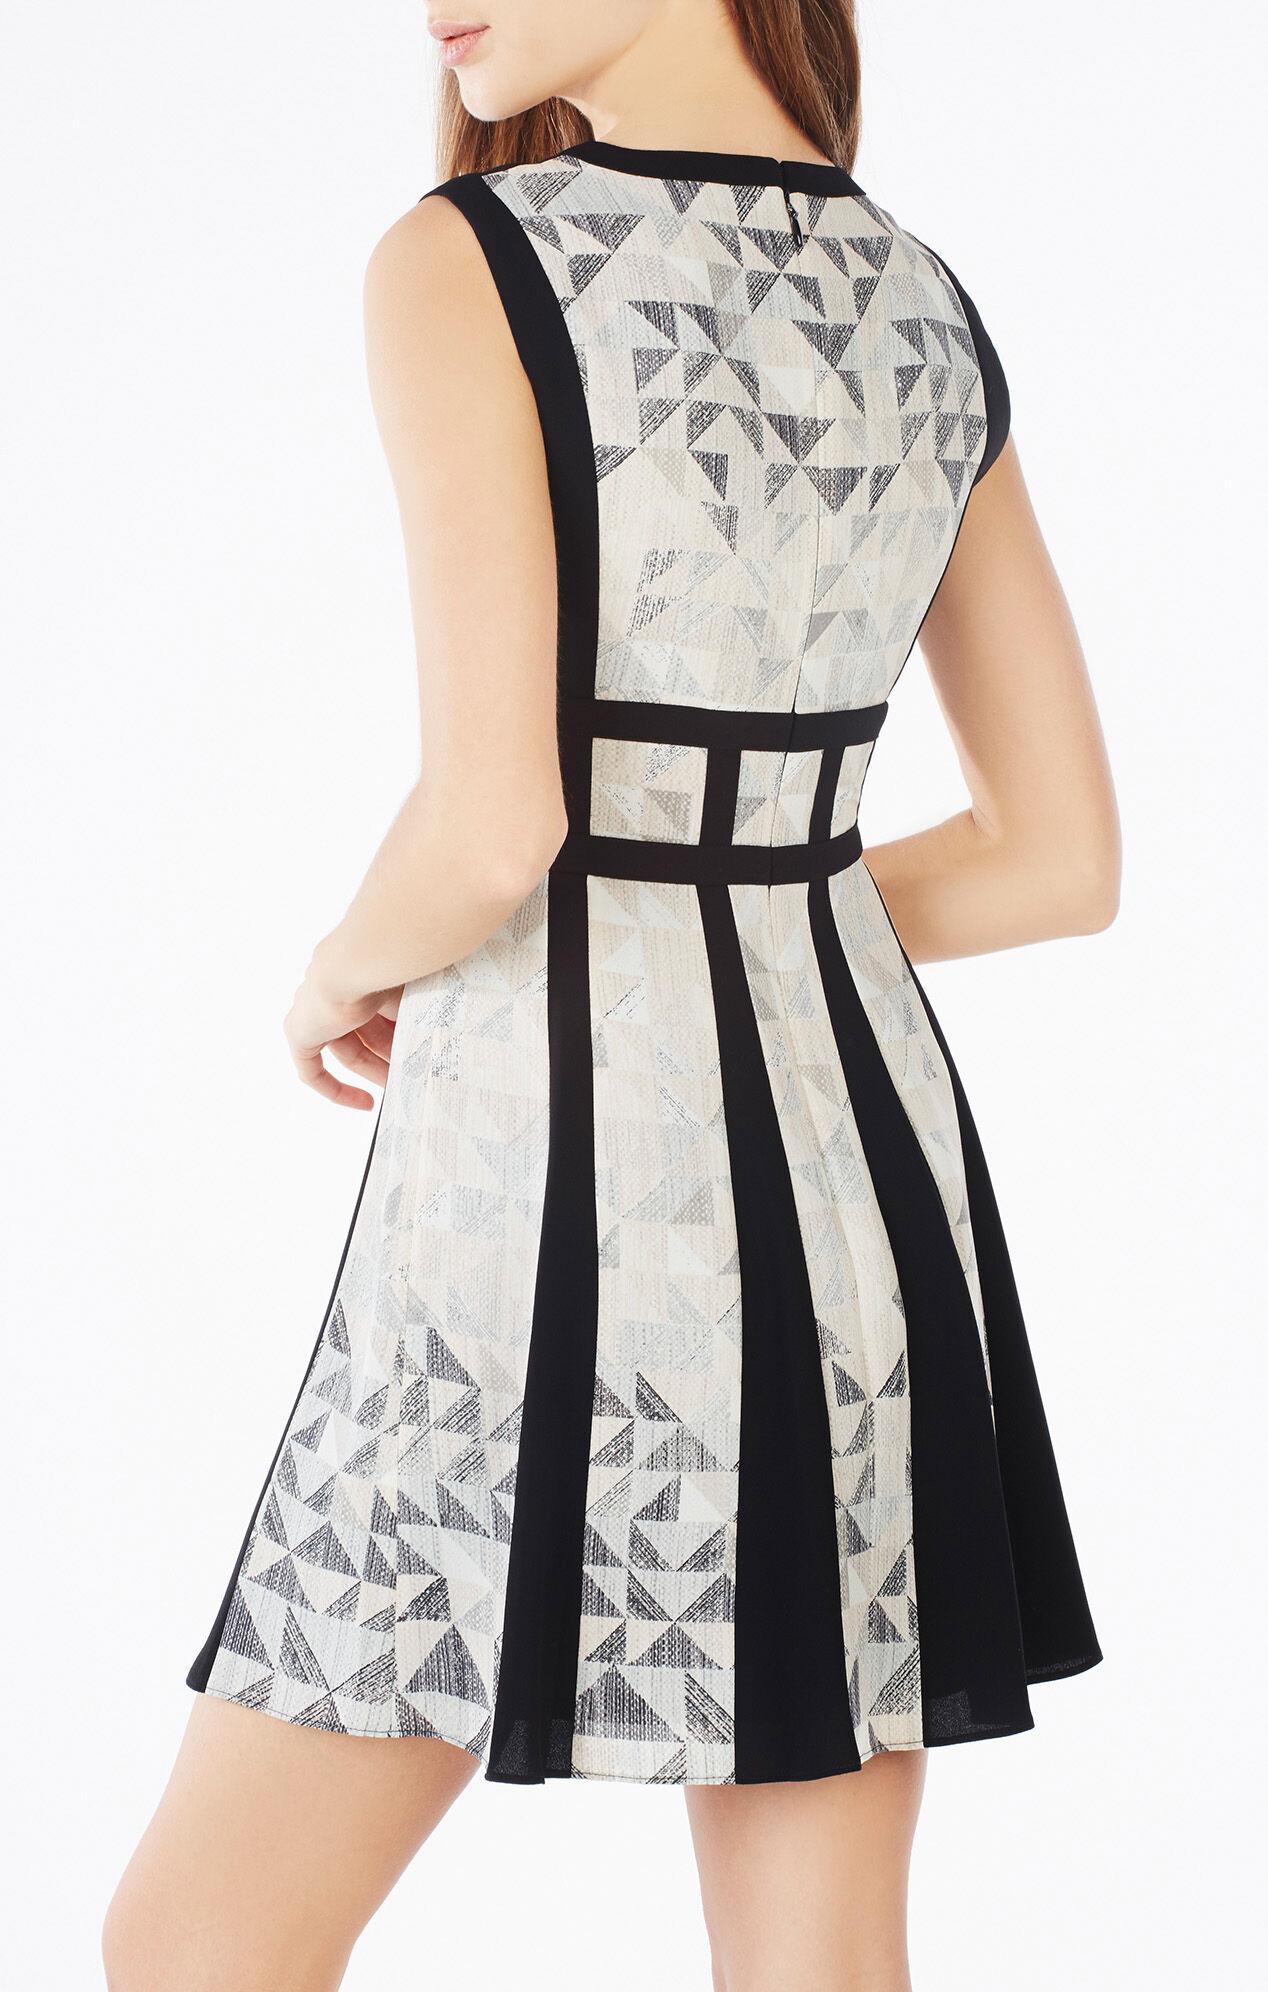 Val Triangle Print-Blocked Dress